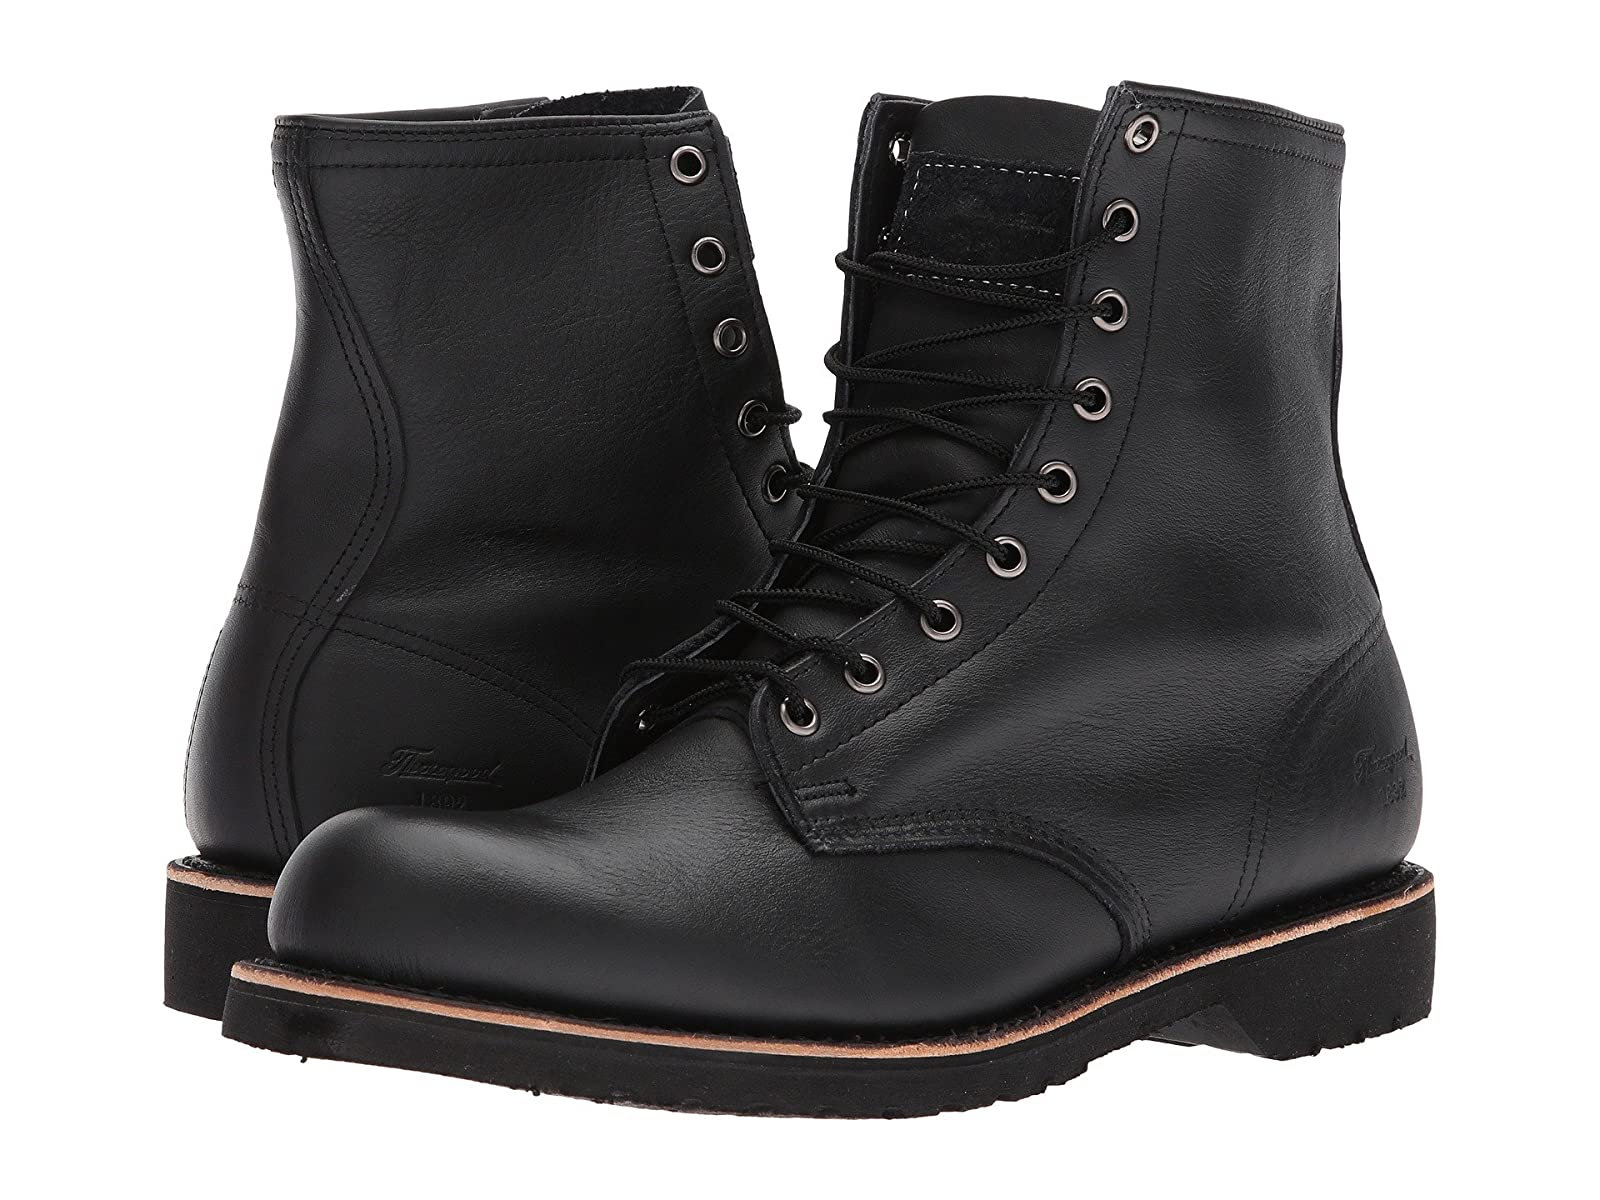 Thorogood Thorogood 1892 - TomahawkEconomical and quality shoes